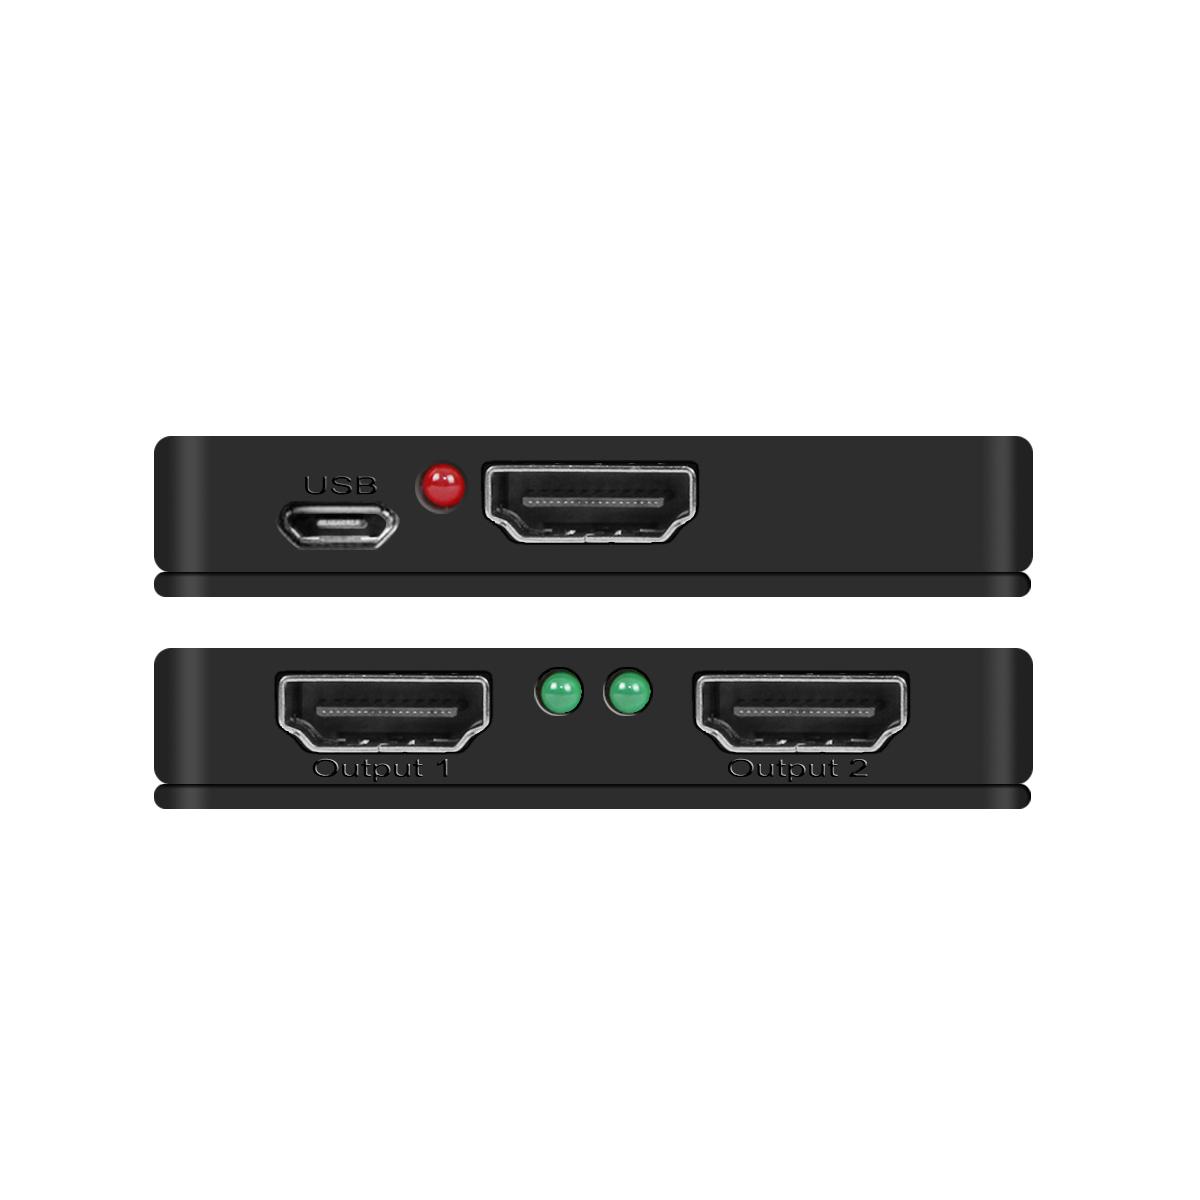 HDMI Сплиттер (1х2) разветлитель